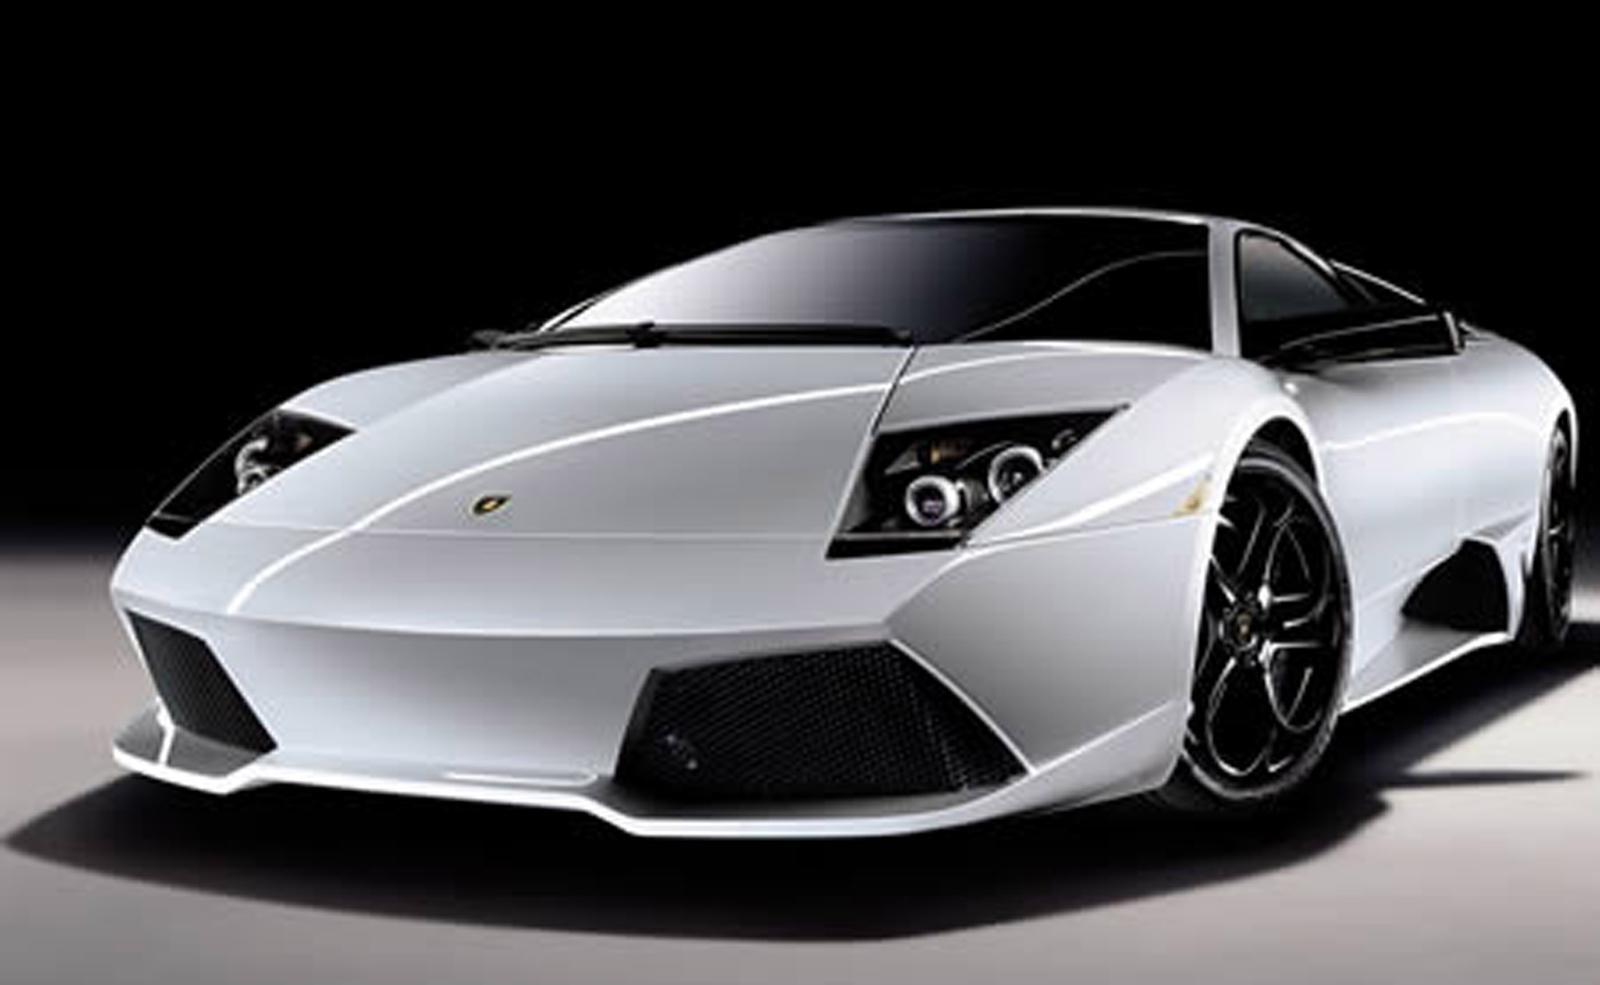 Picture of 2009 Lamborghini Murcielago LP640 Coupe